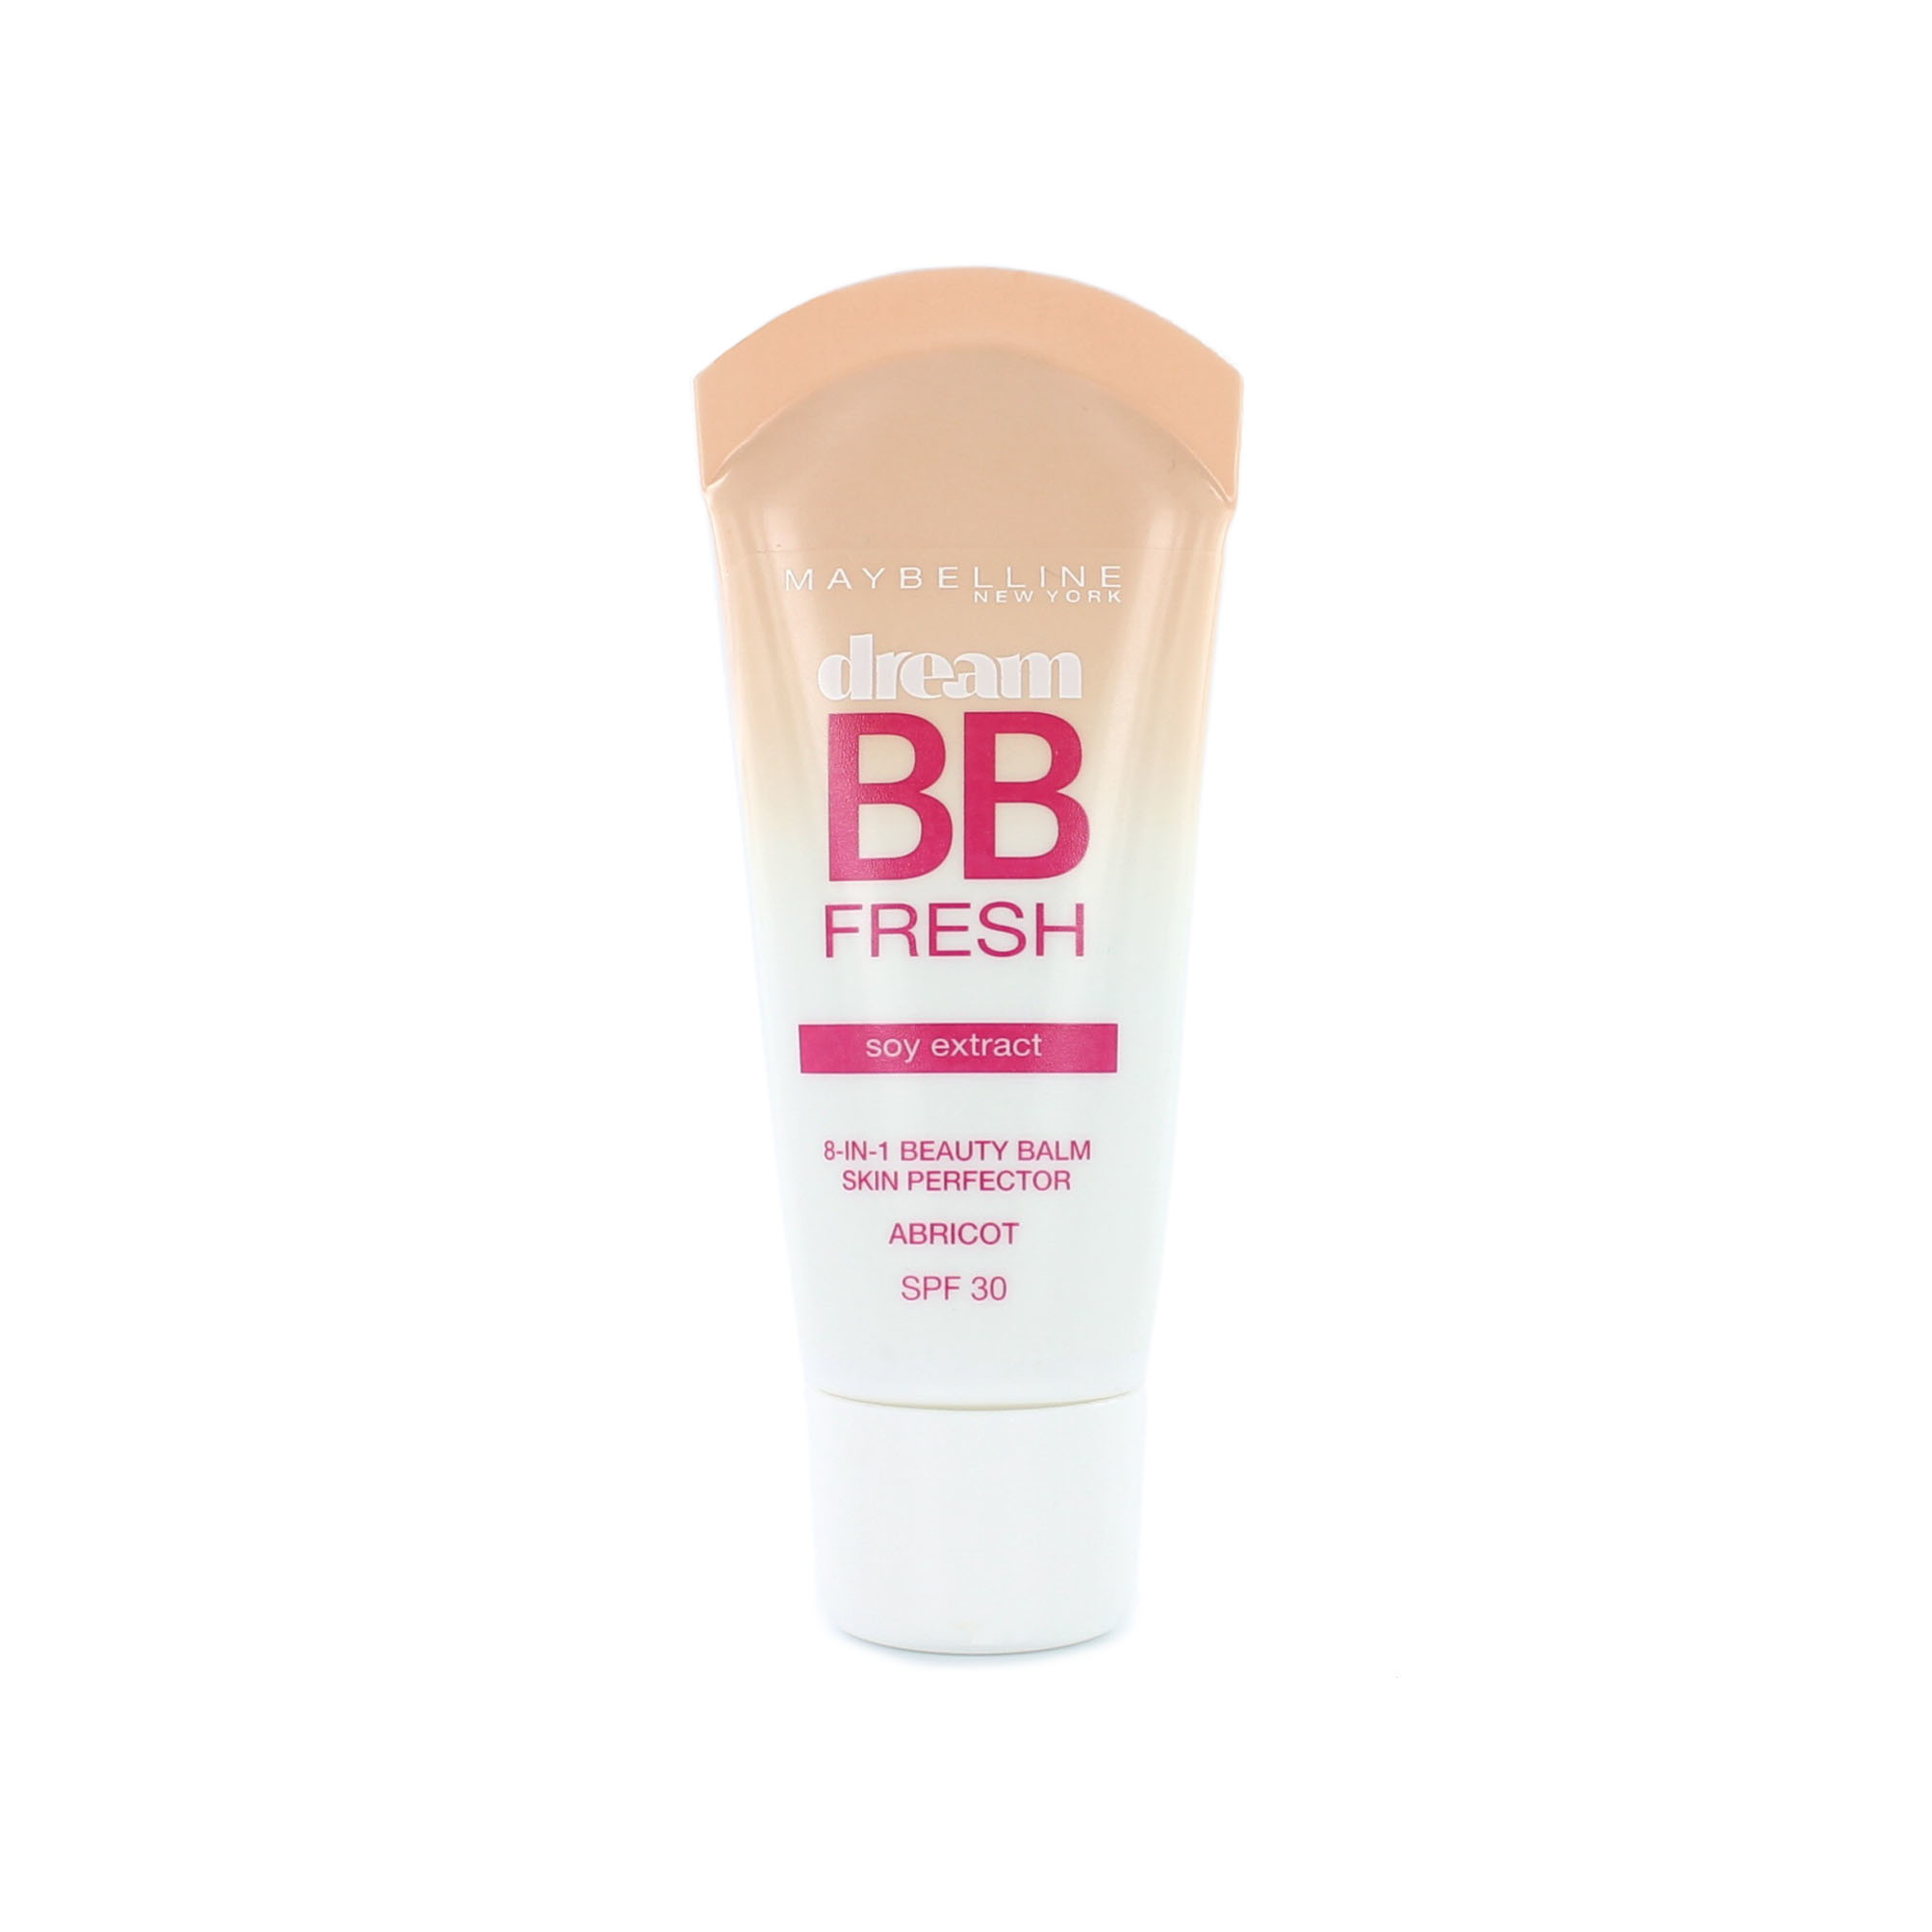 Maybelline Dream Fresh BB Cream Met Soya Extract - Abricot